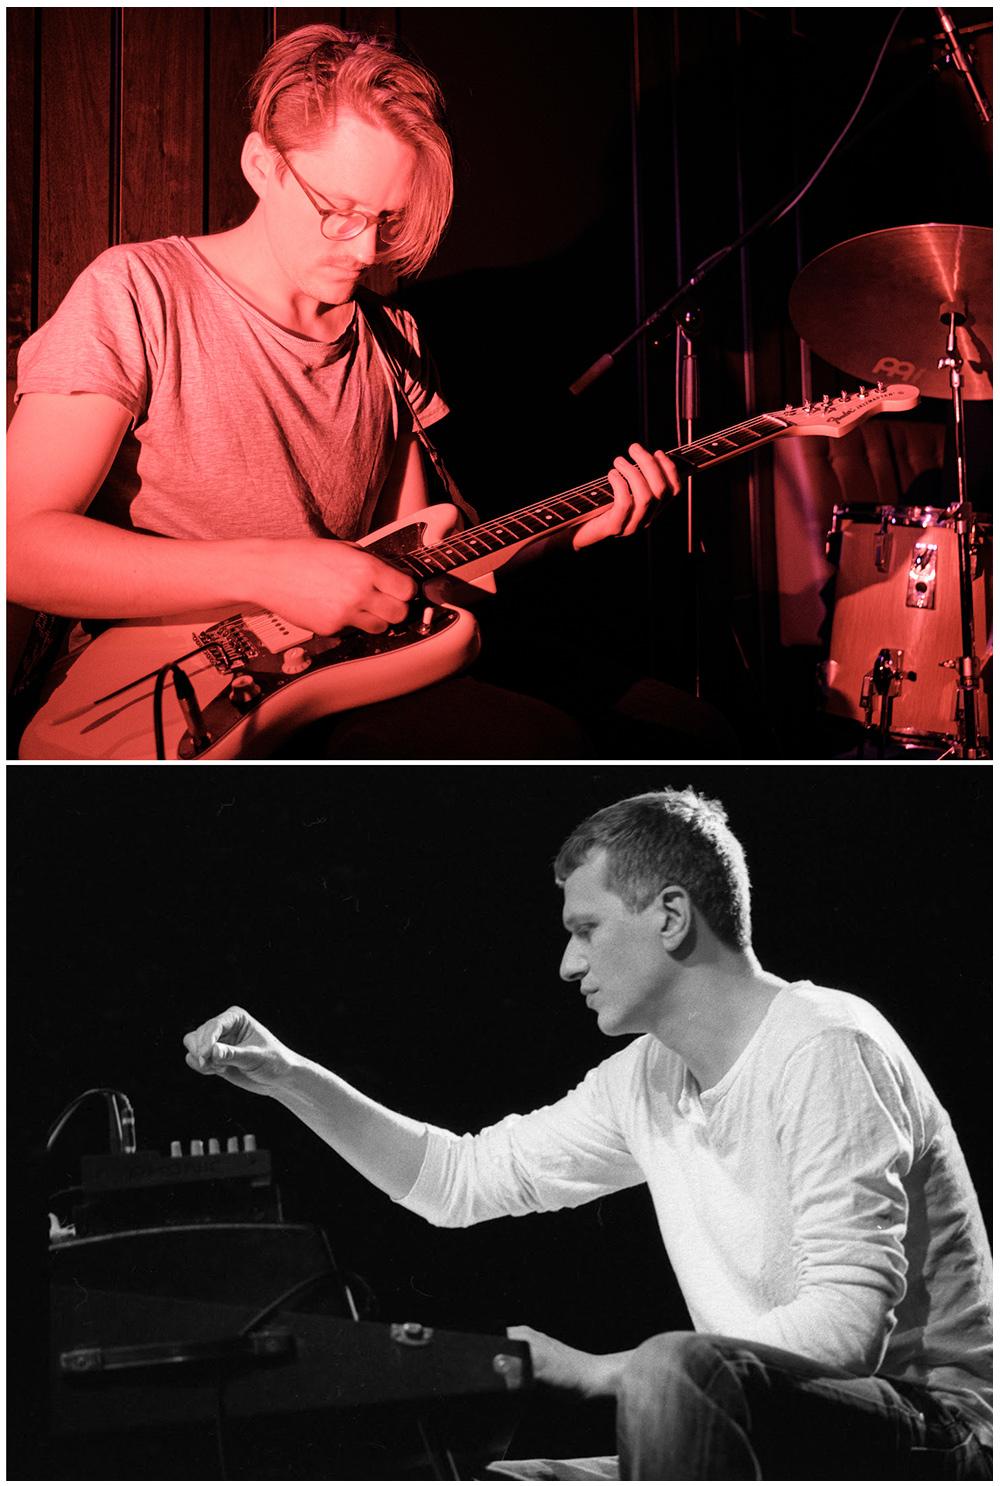 David Helm, Jozef Dumoulin, livestream, LOFT, Cologne, Köln, Christian Heck, jazzstadt, jazzstadt köln